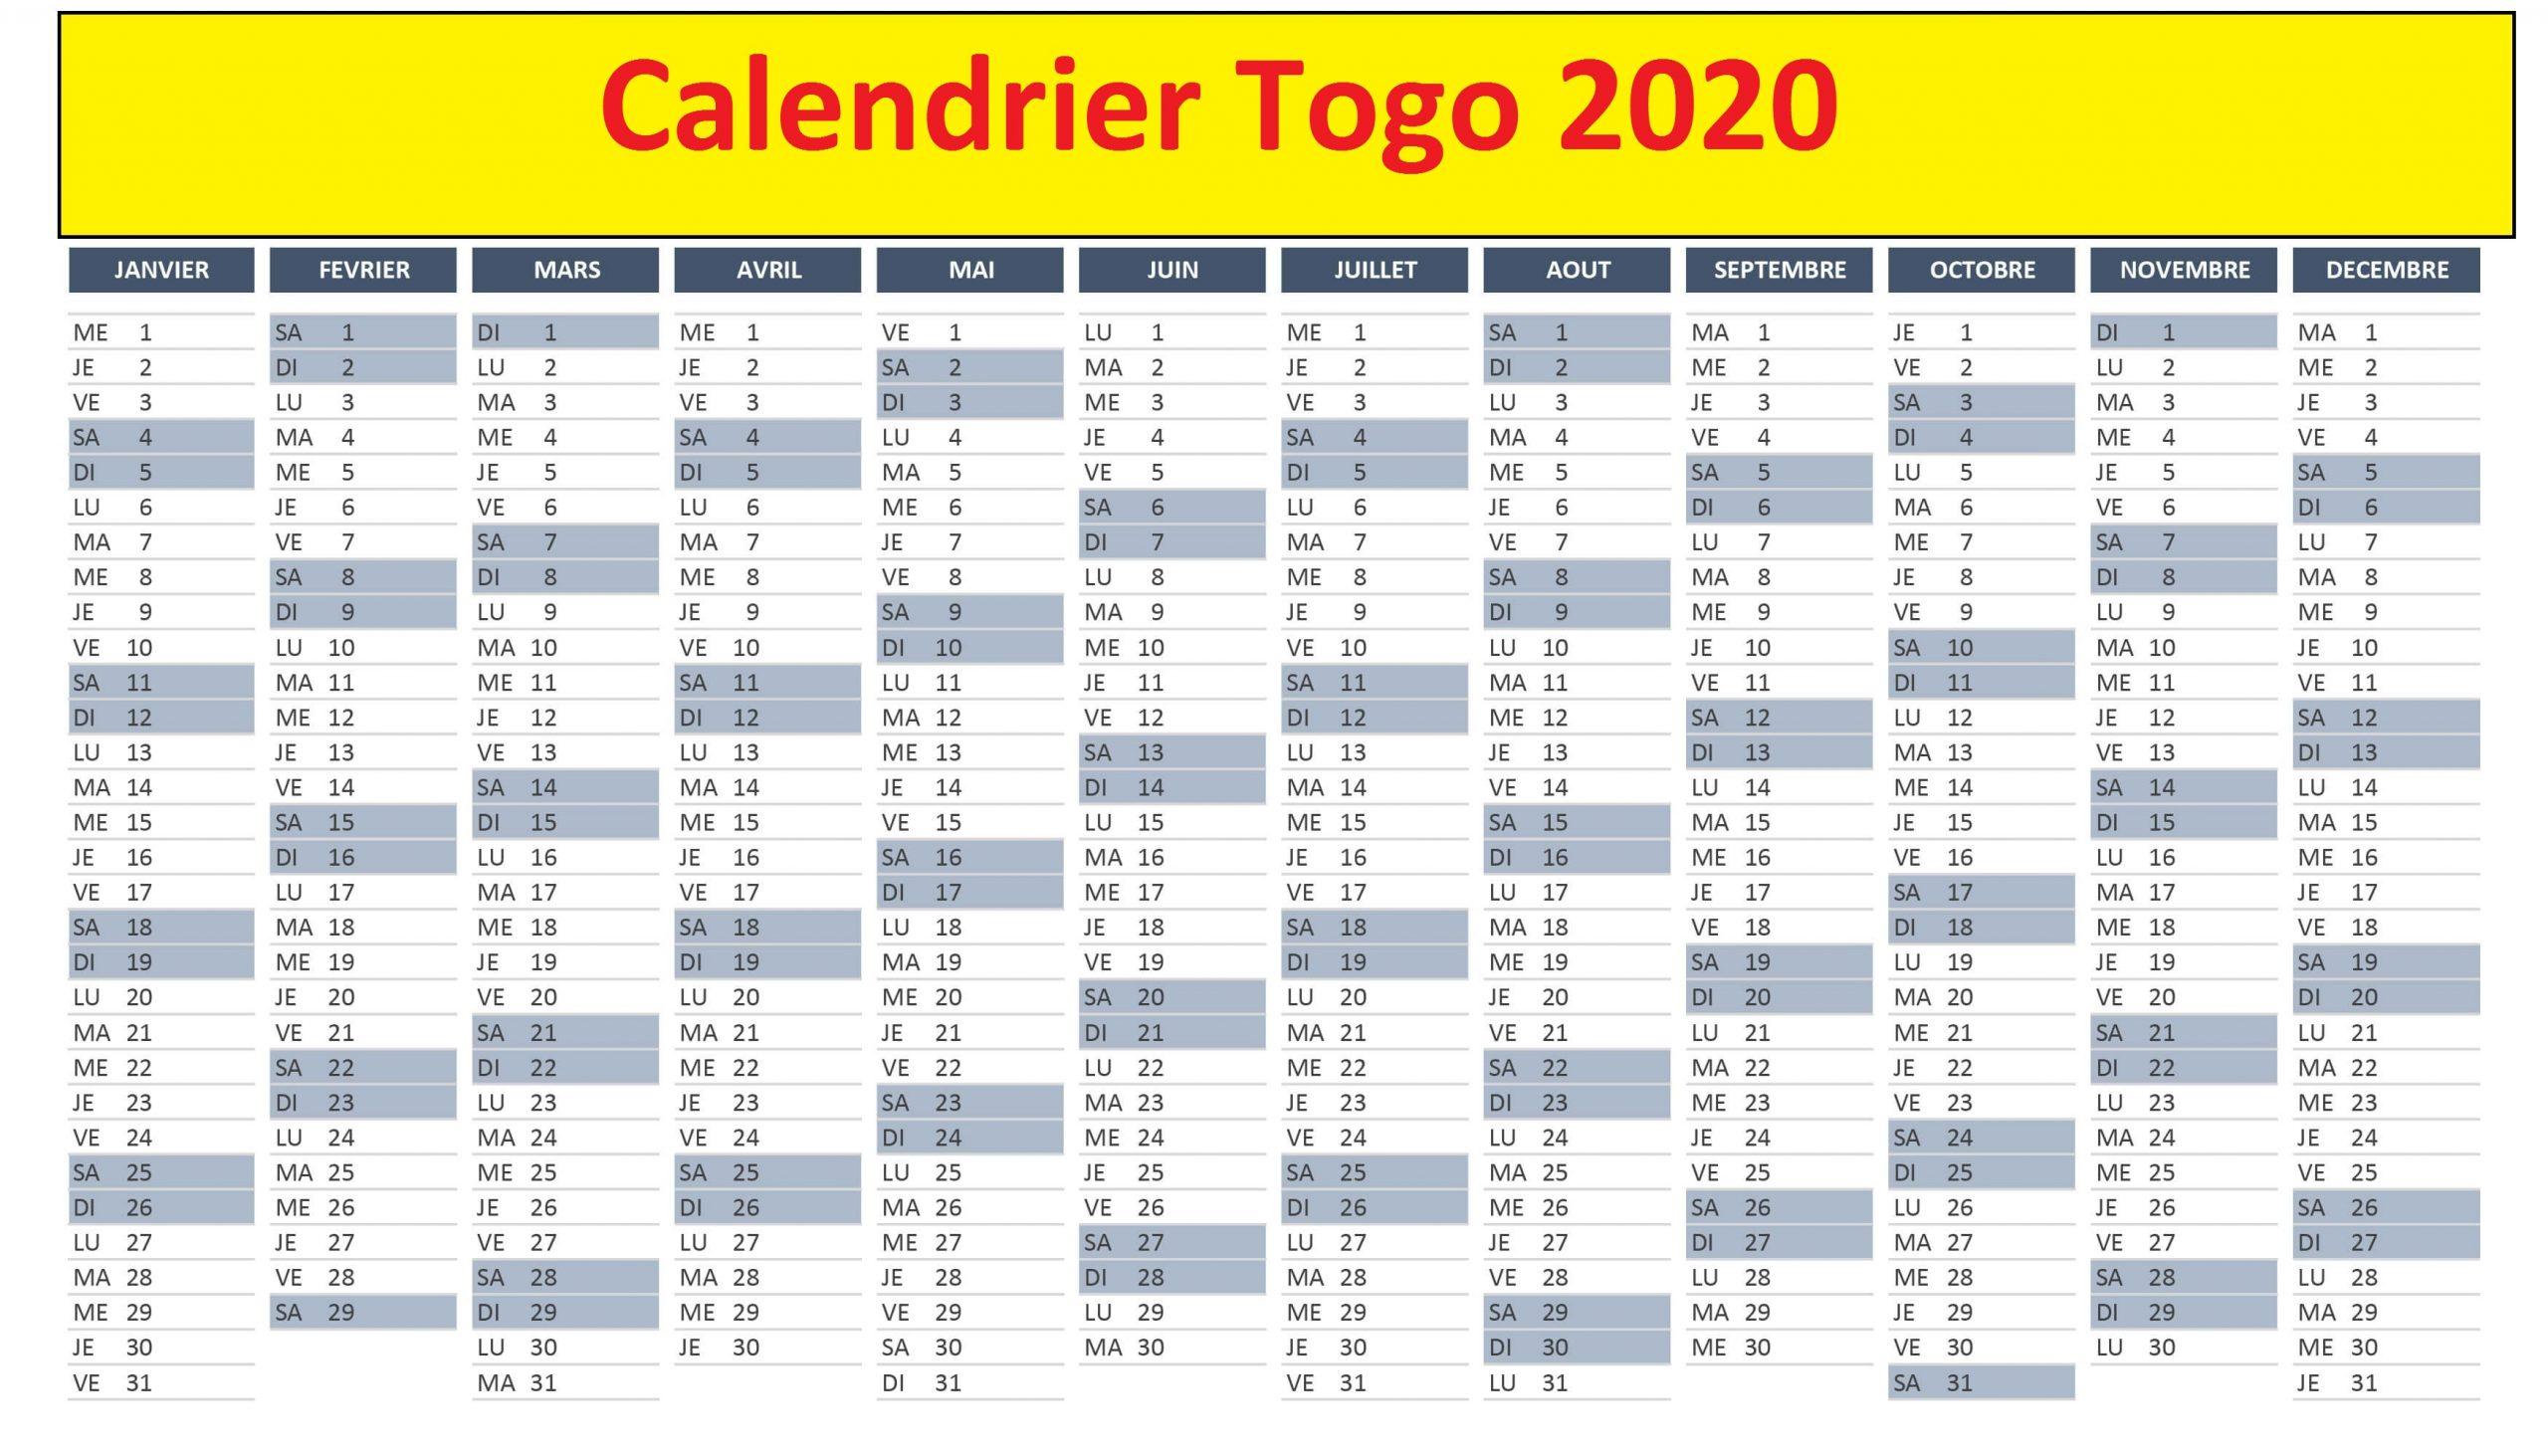 Calendrier Fiscal 2020 Togo